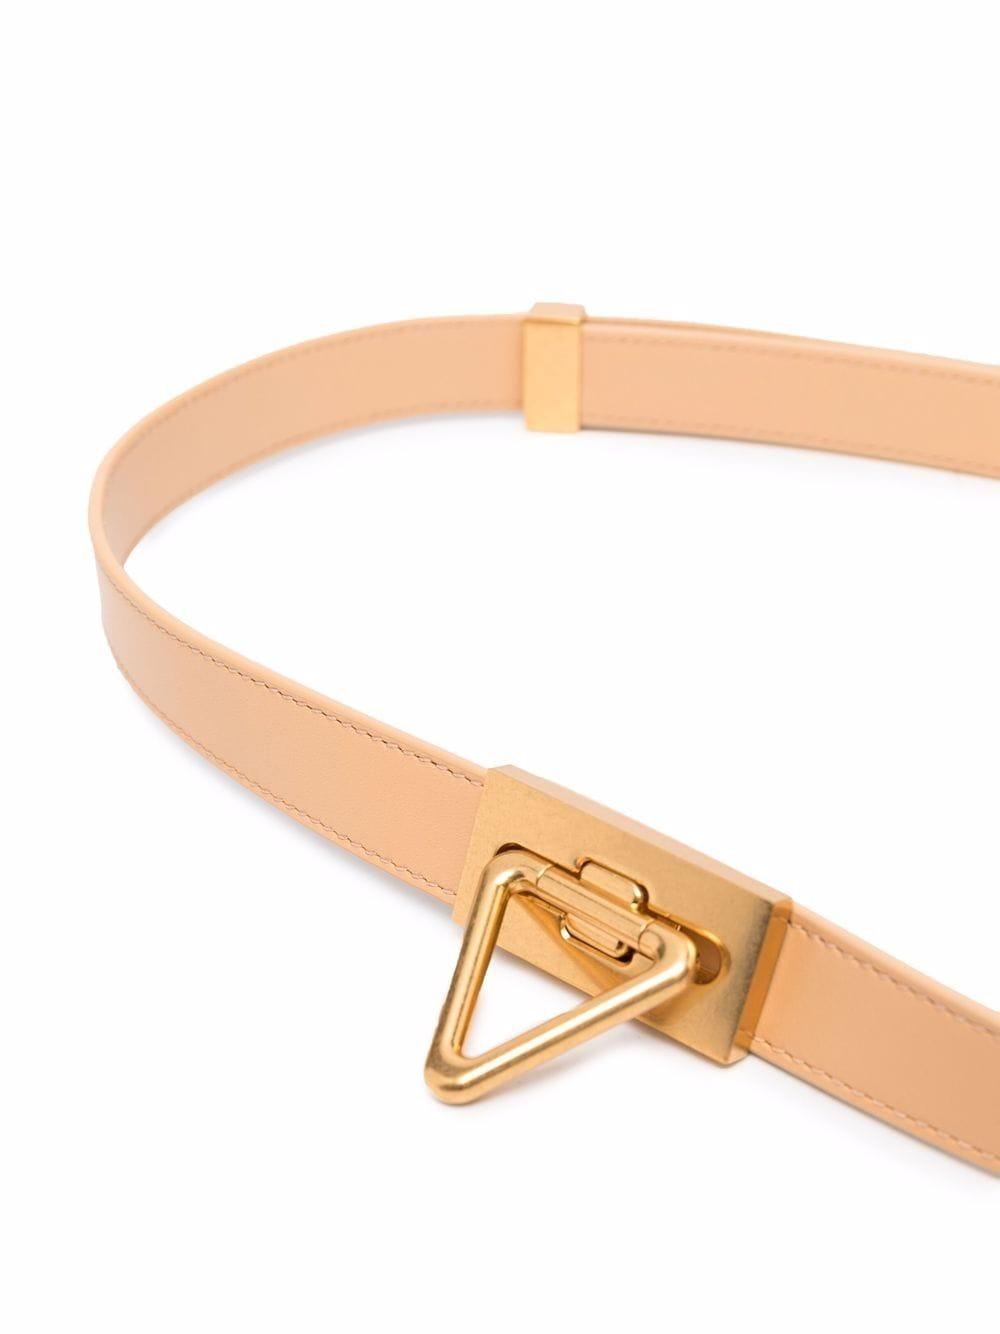 Picture of Bottega Veneta   Triangle Buckle Belt